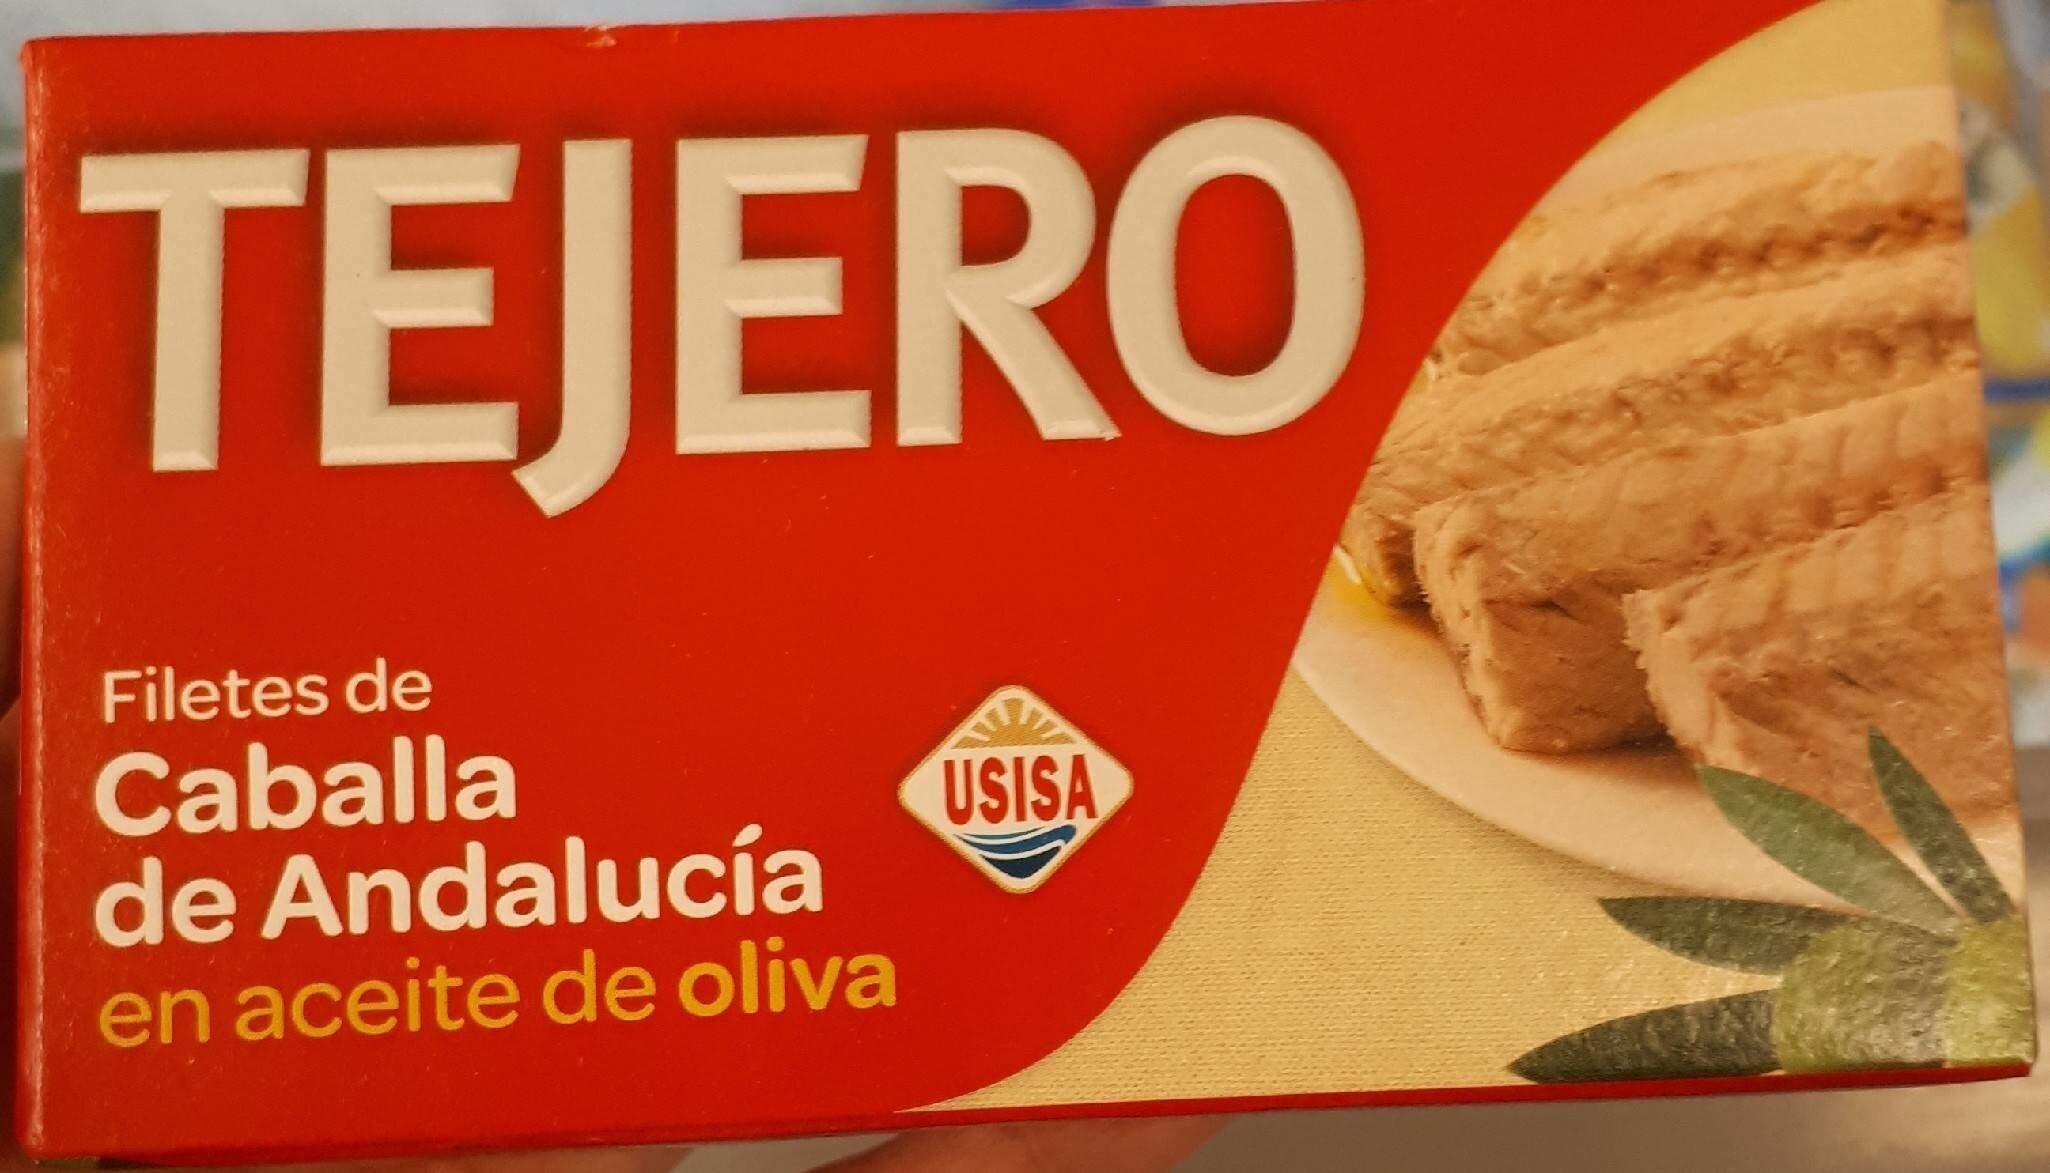 Filetes de caballa de Andalucía en aceite de oliva - Produit - es